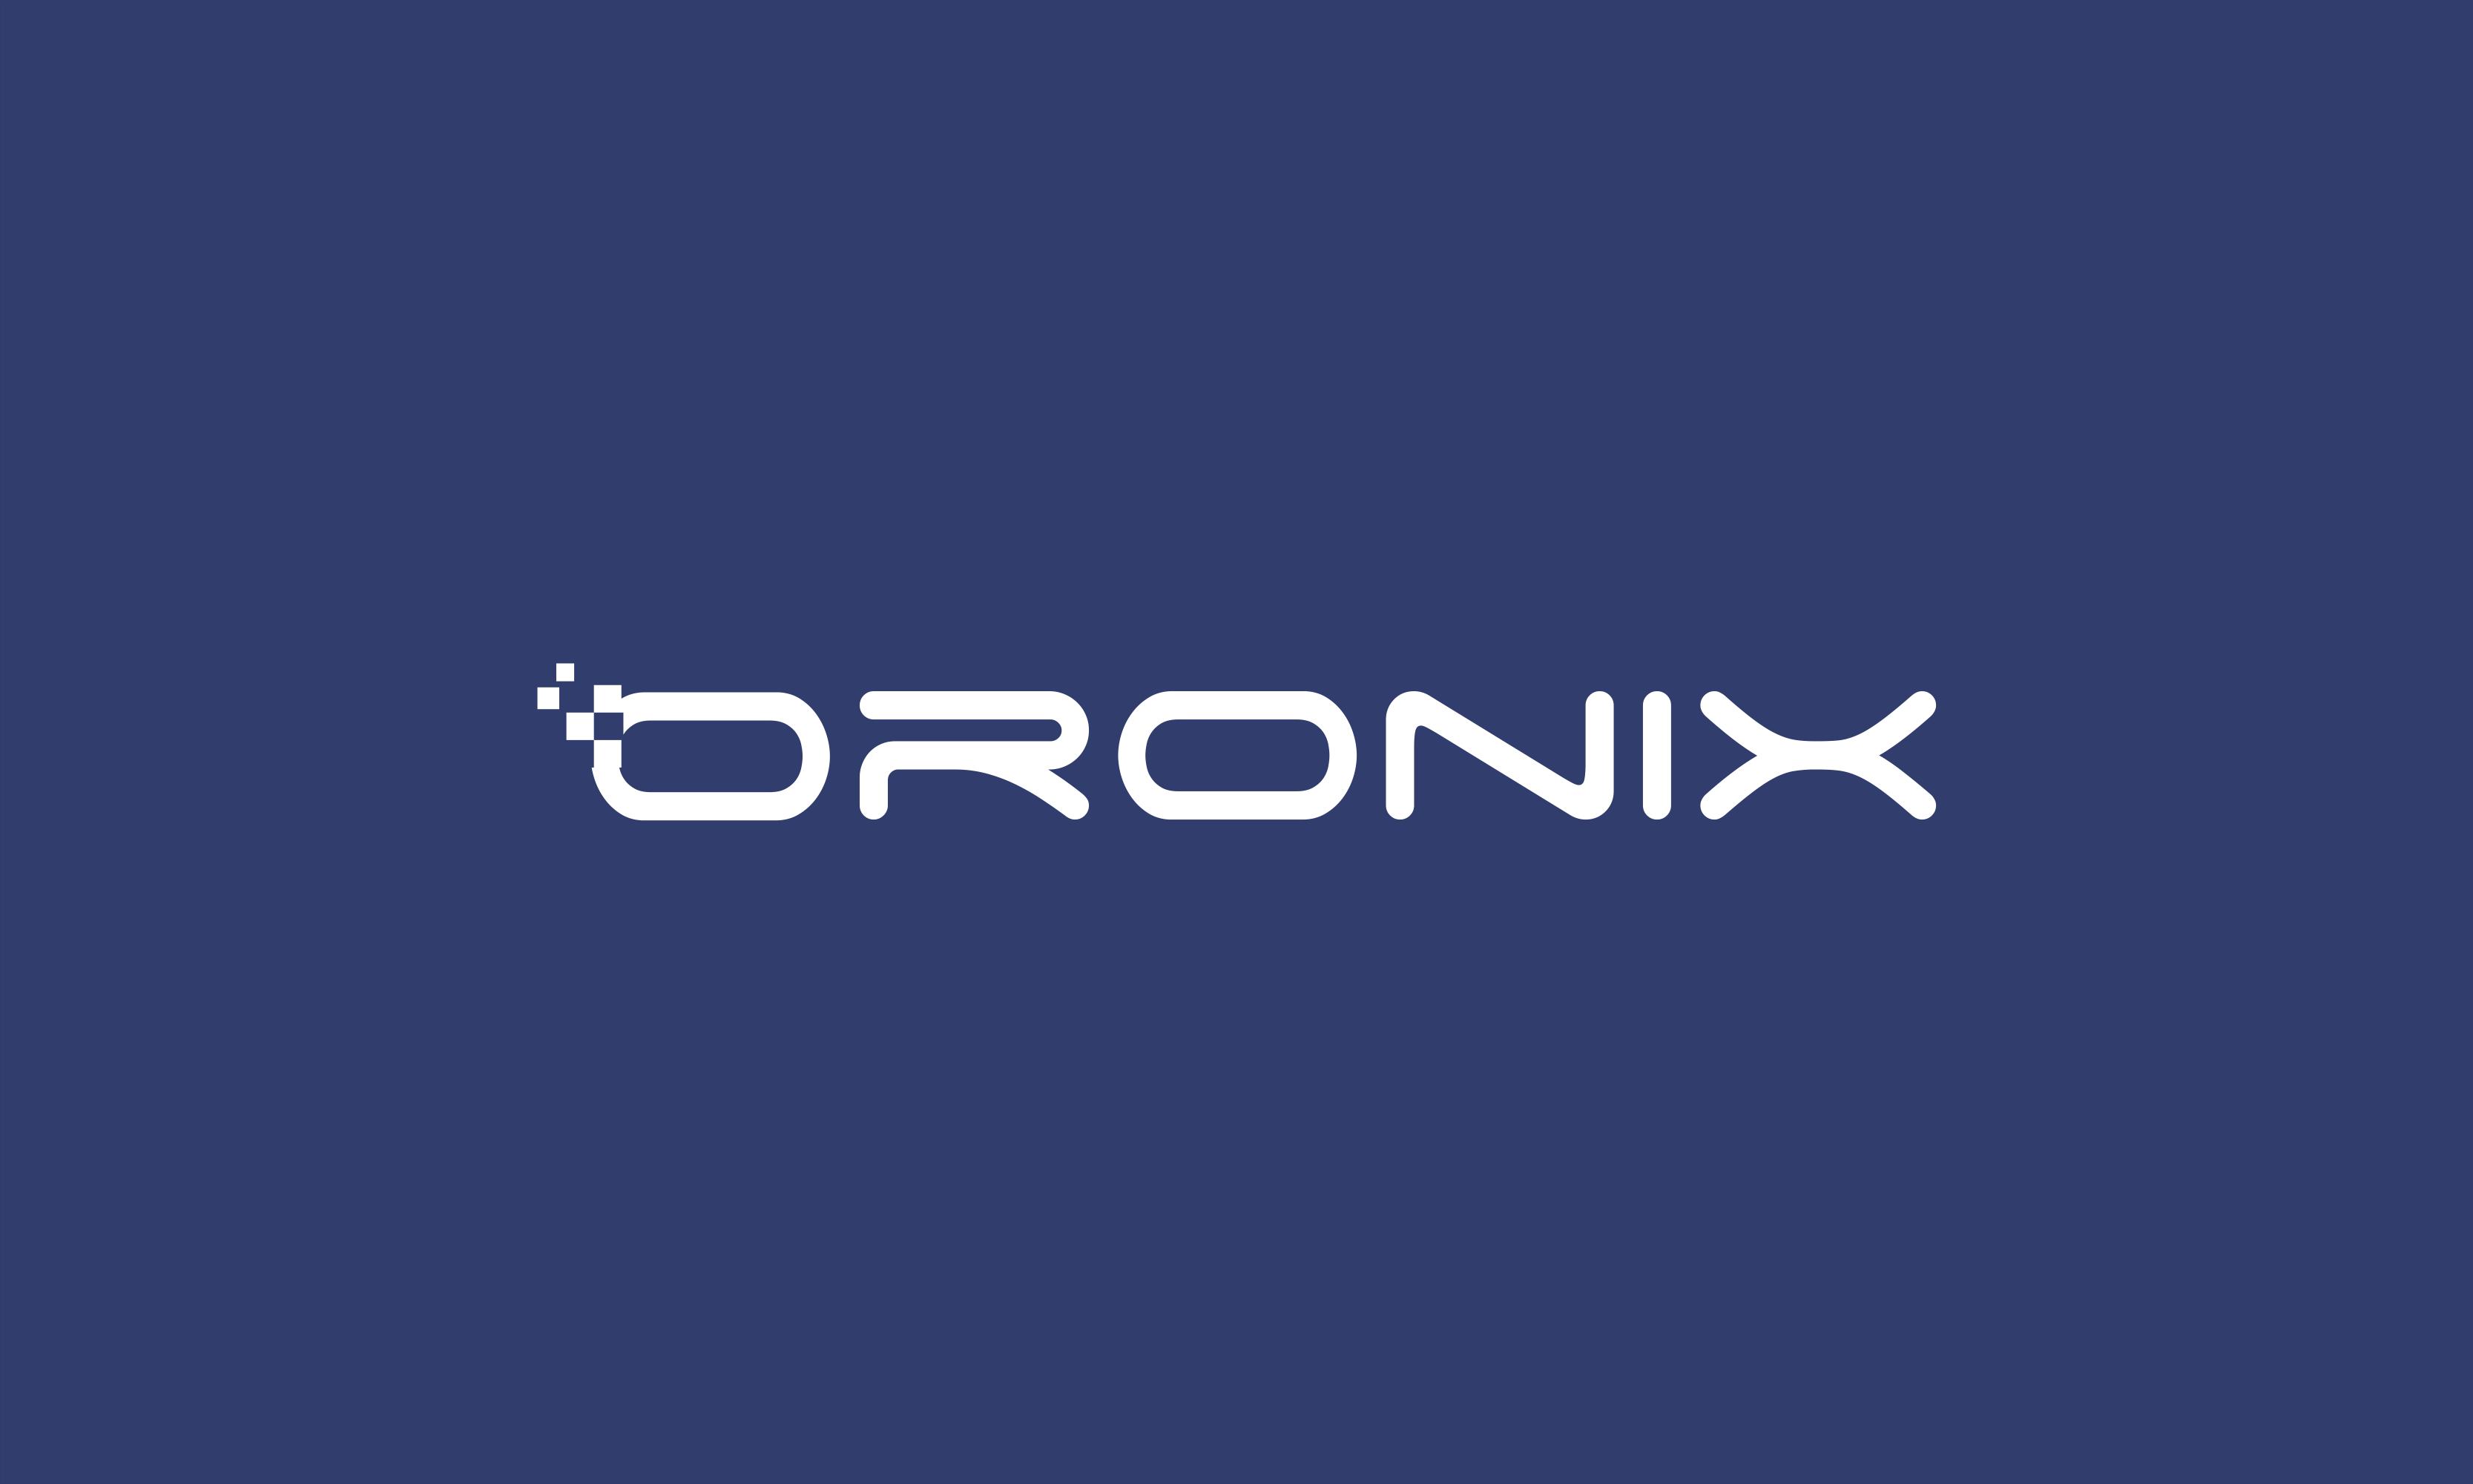 Oronix